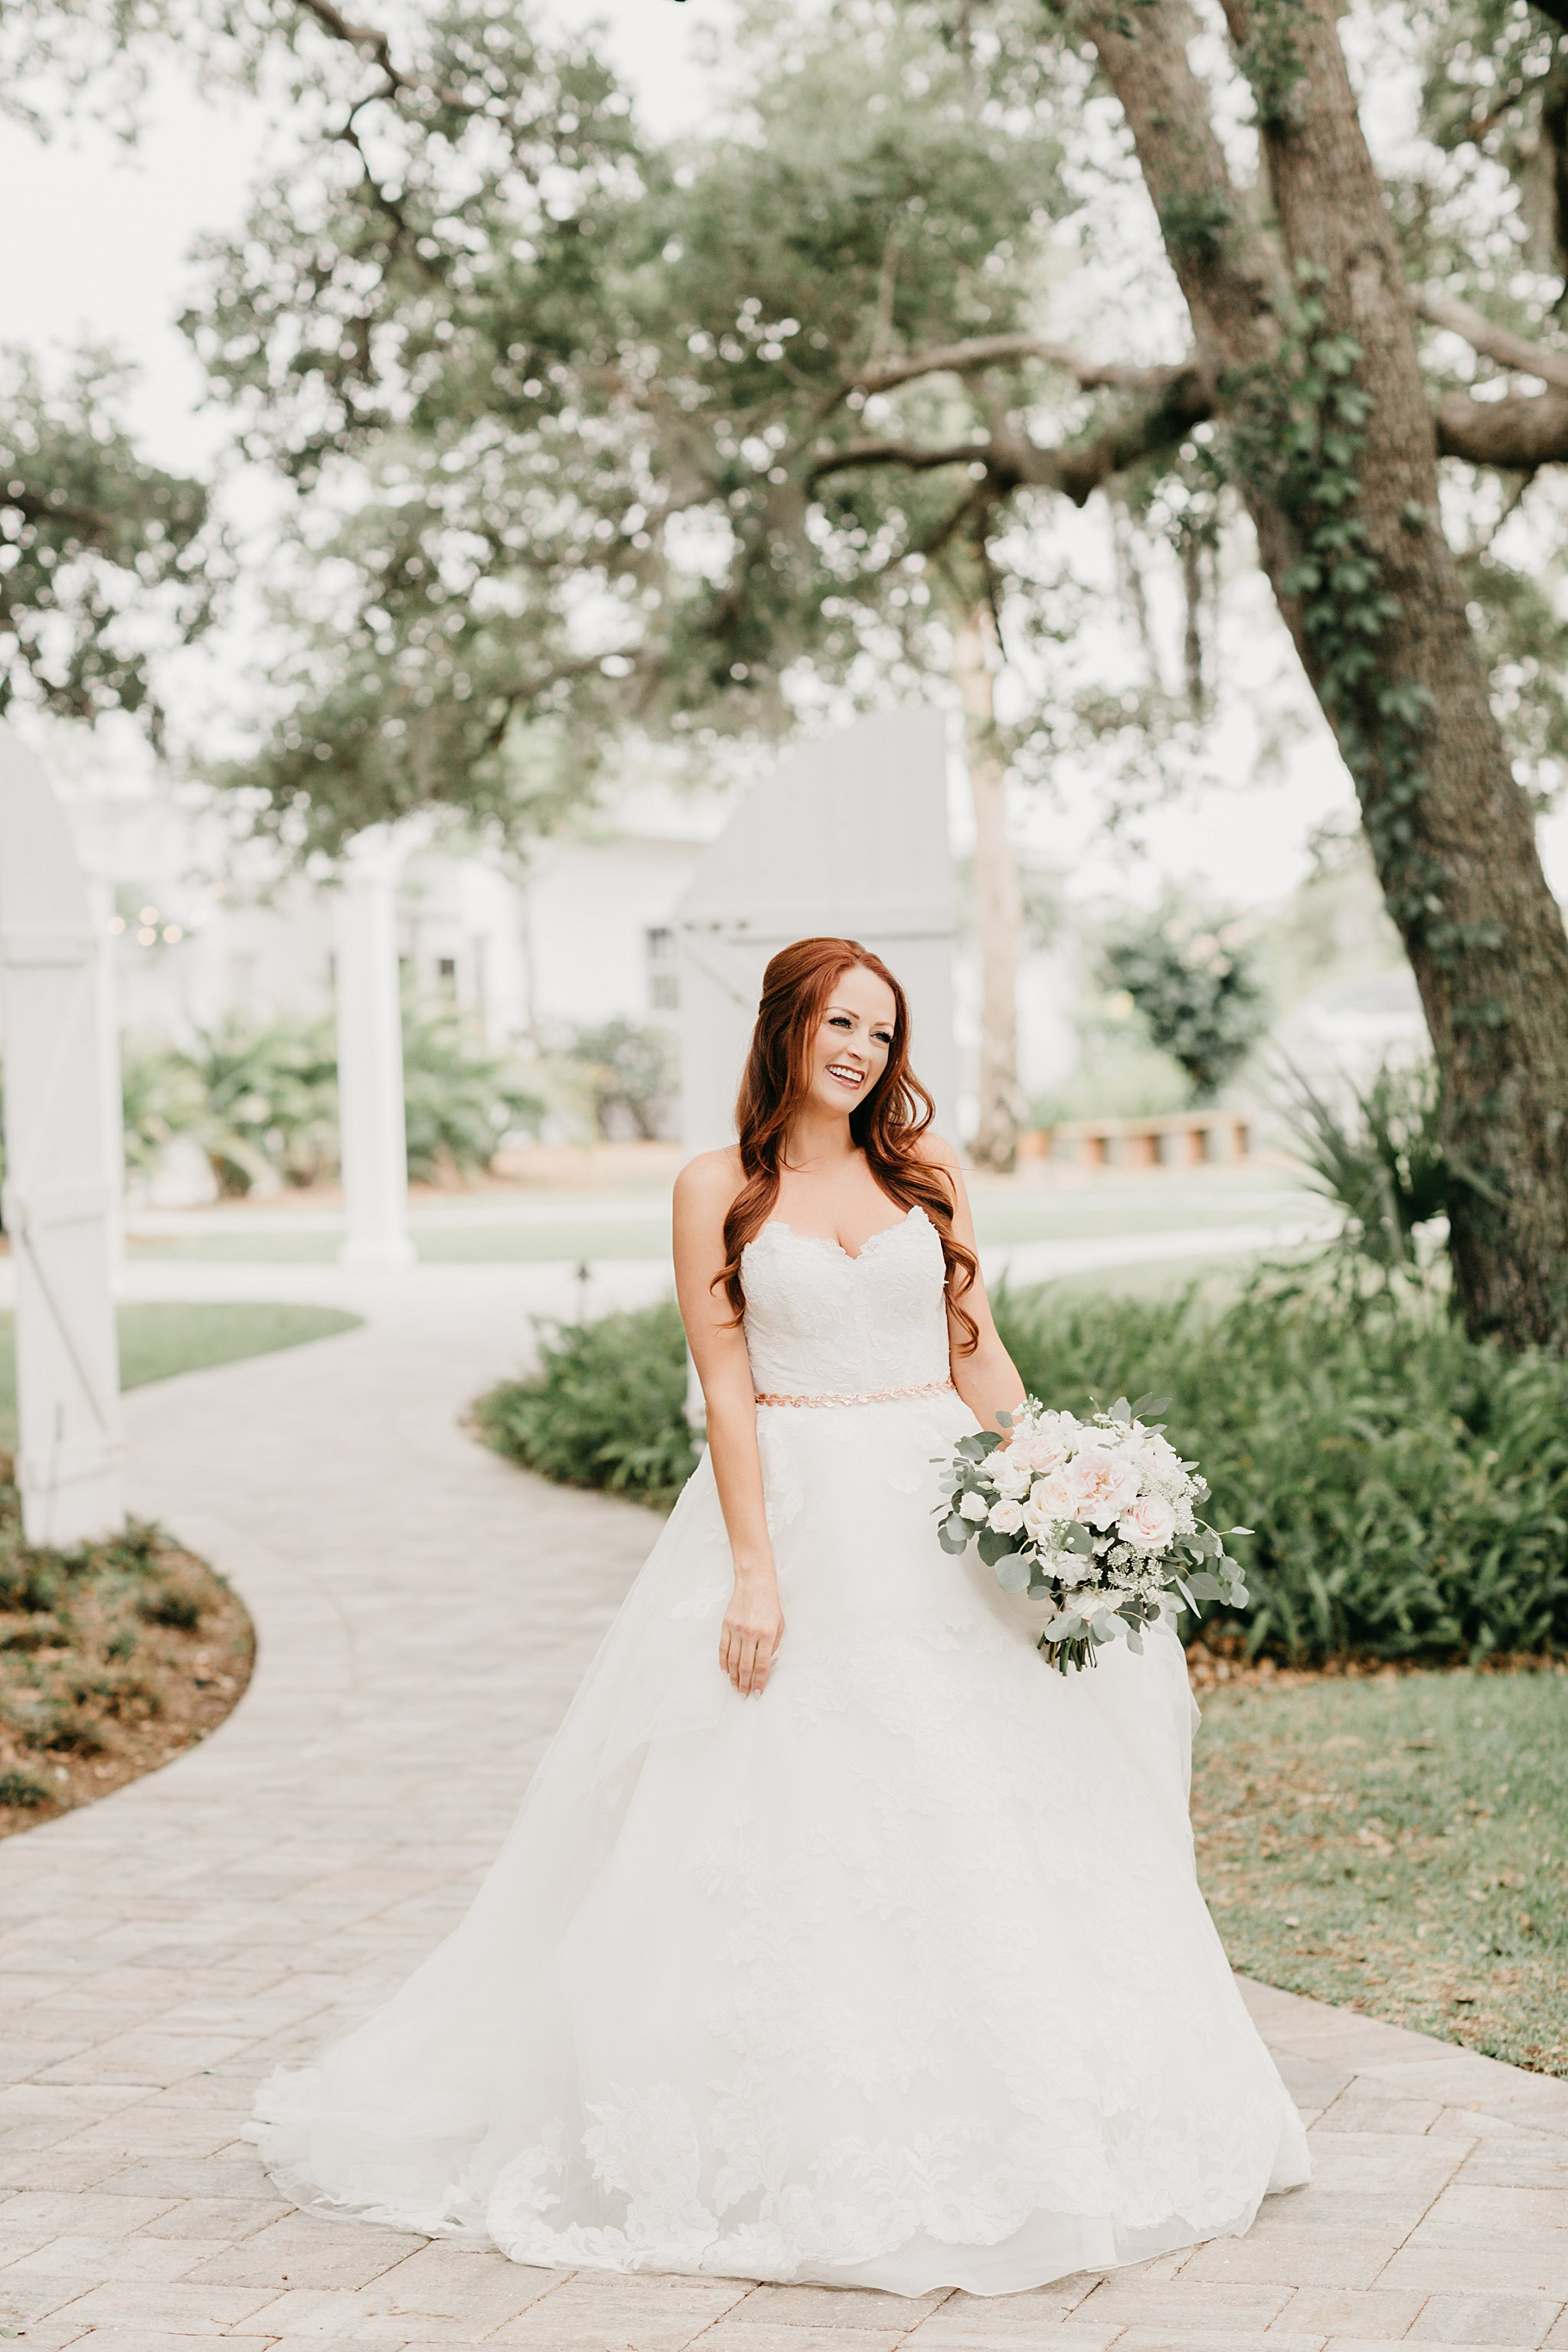 JessicaBordnerPhotography_5082.jpg